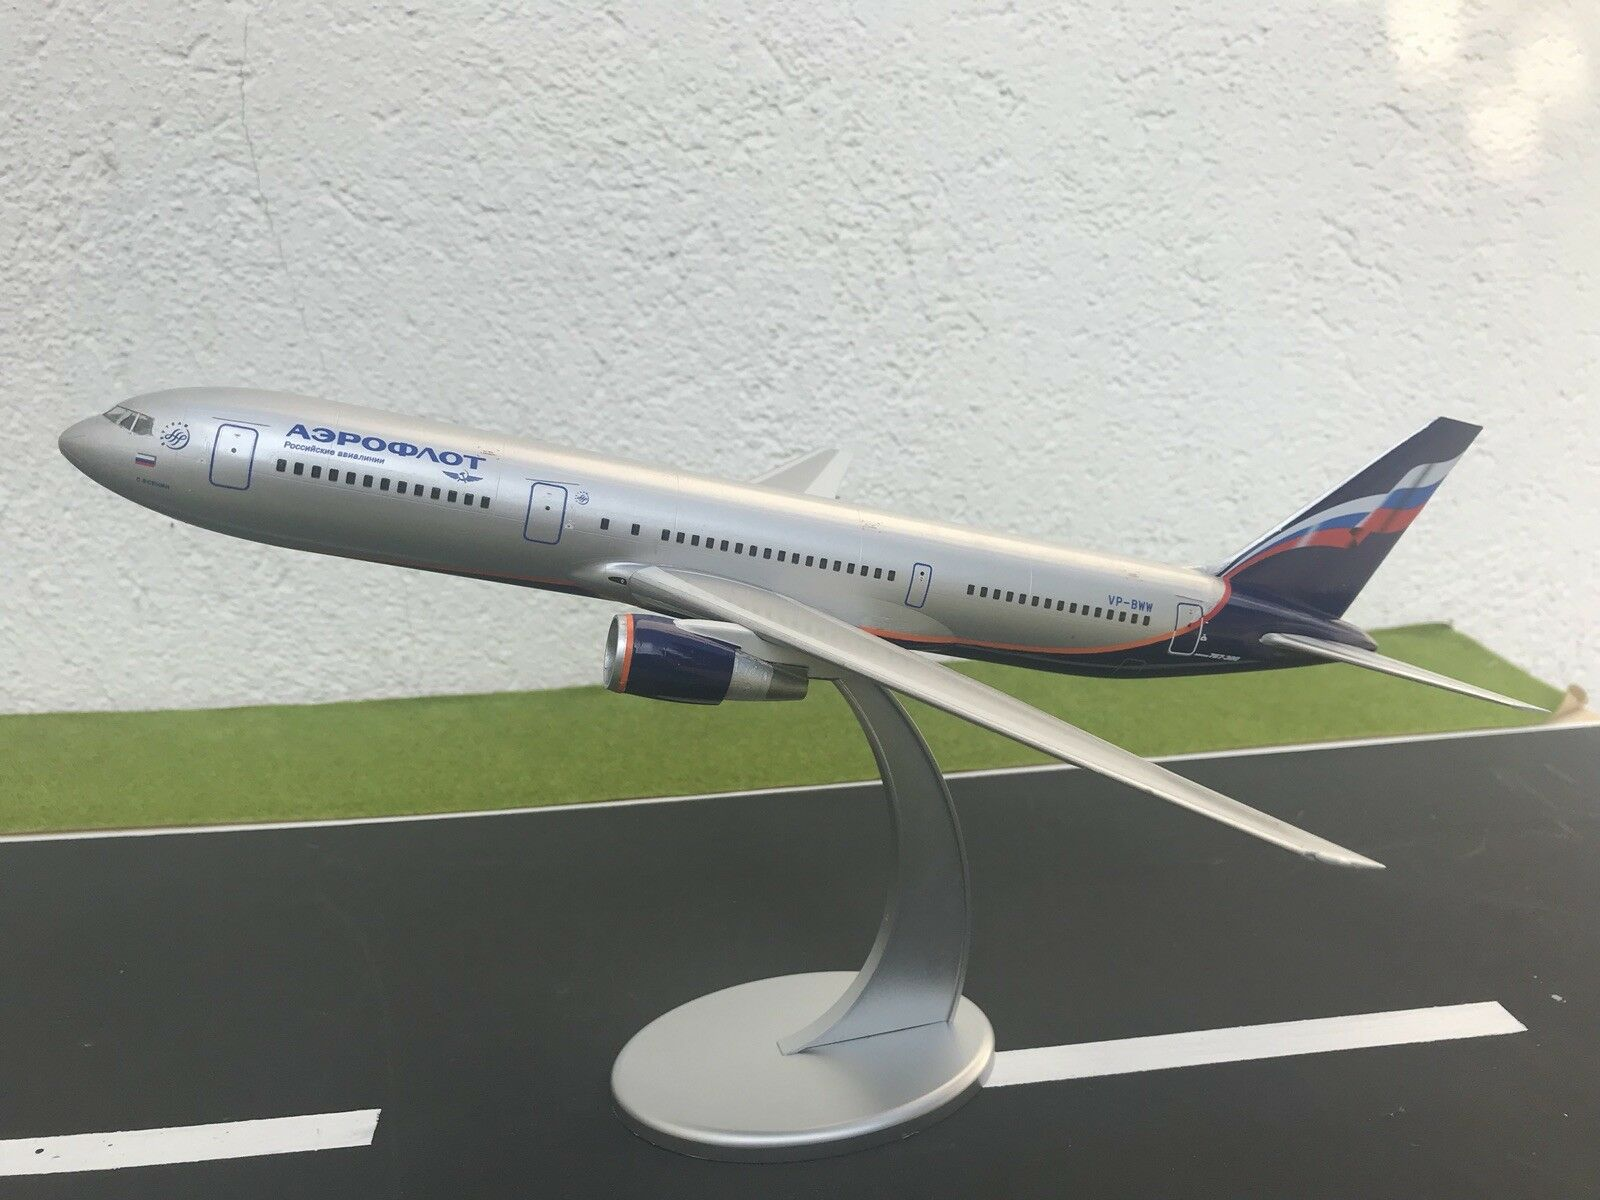 Boeing 767-300 Aeroflot Bureau model, échelle 1 144